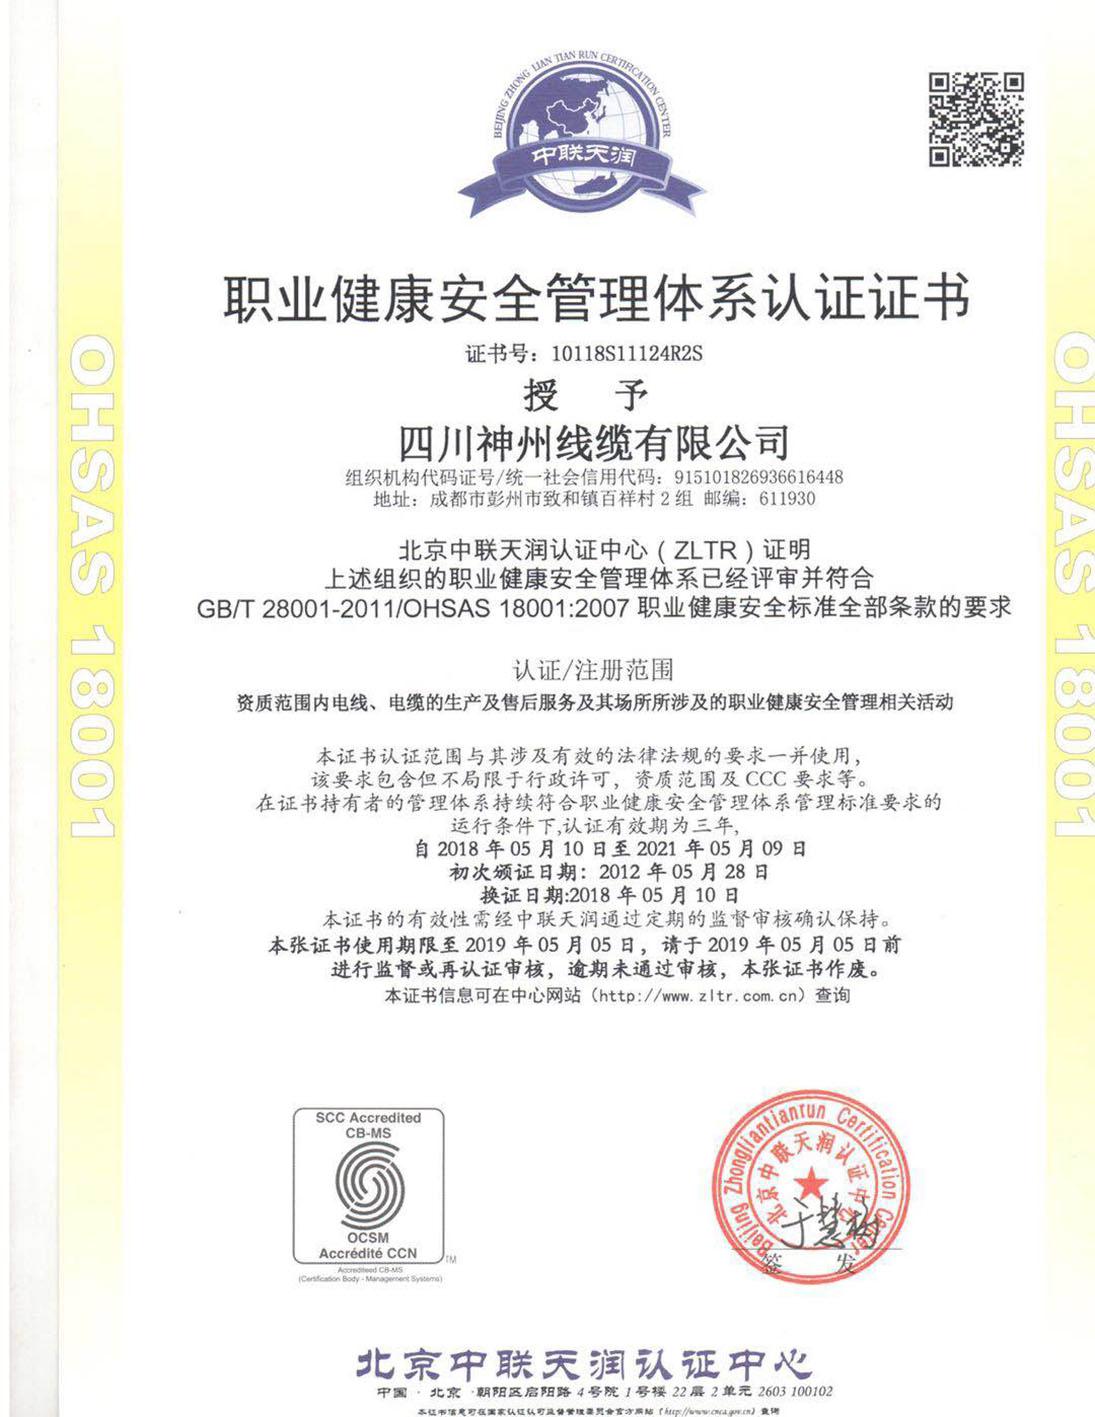 P好证书-0ece9c1e-1def-465c-9bf9-be2f43464692